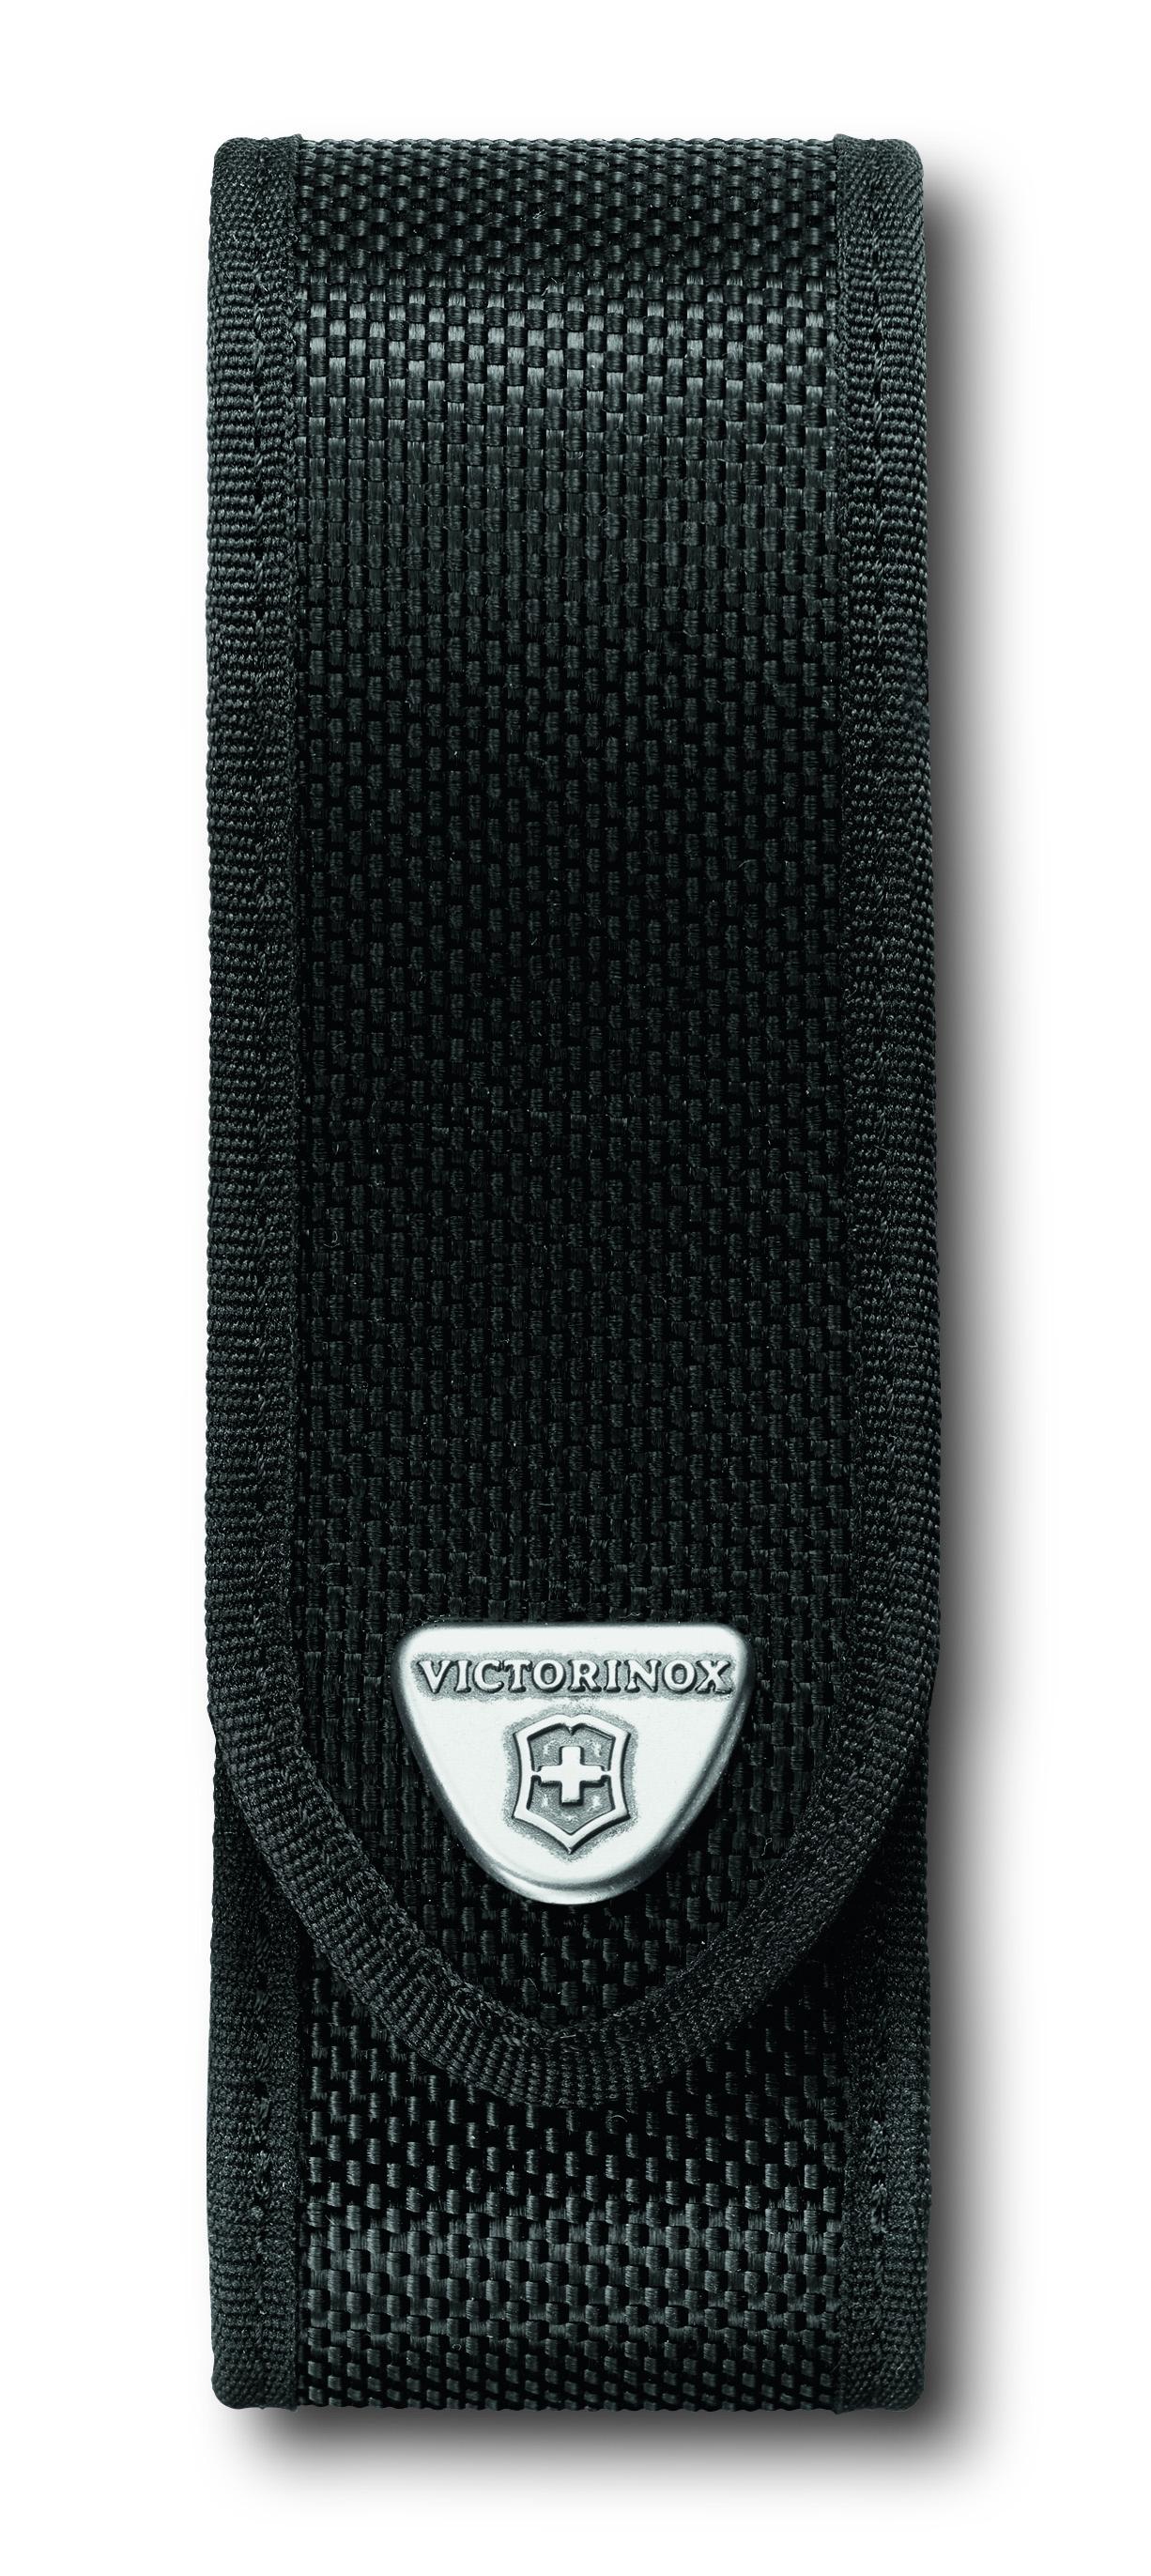 Чехол для ножей Victorinox RangerGrip, на ремень, на липучке, цвет: черный, 4 х 4 х 14 см. 4.0506.N